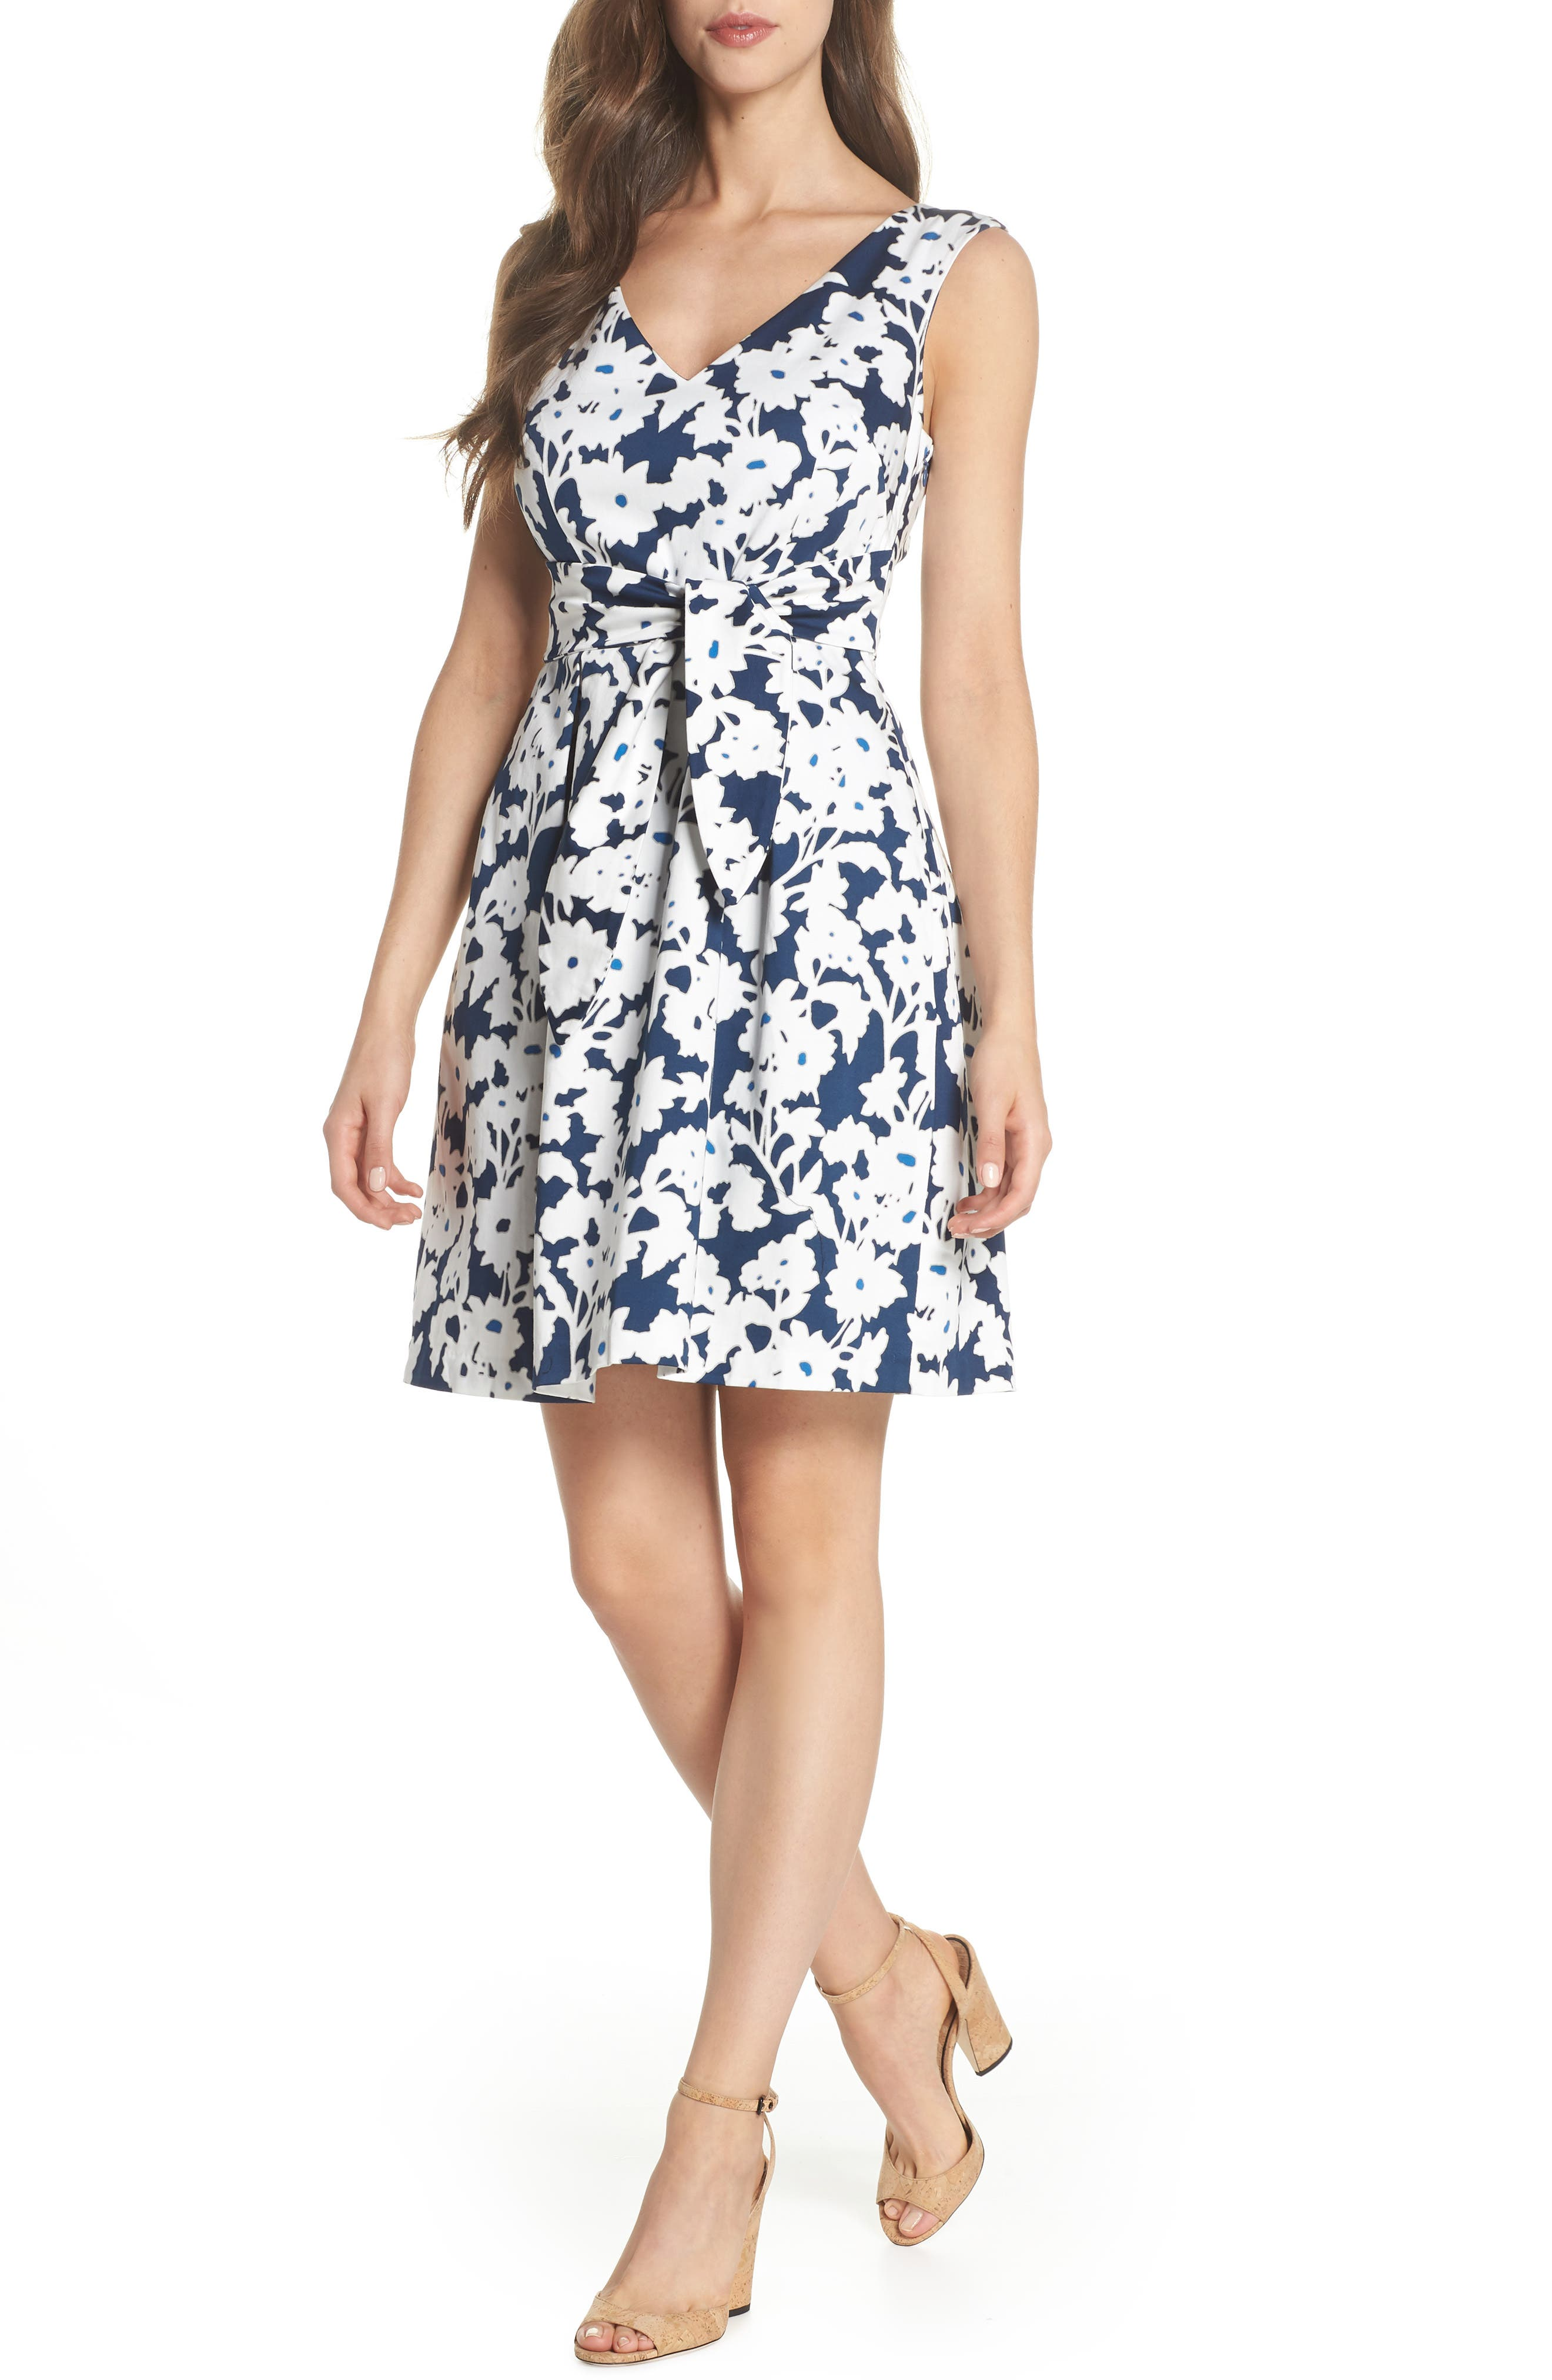 Main Image - Adrianna Papell Daisy Field Fit & Flare Dress